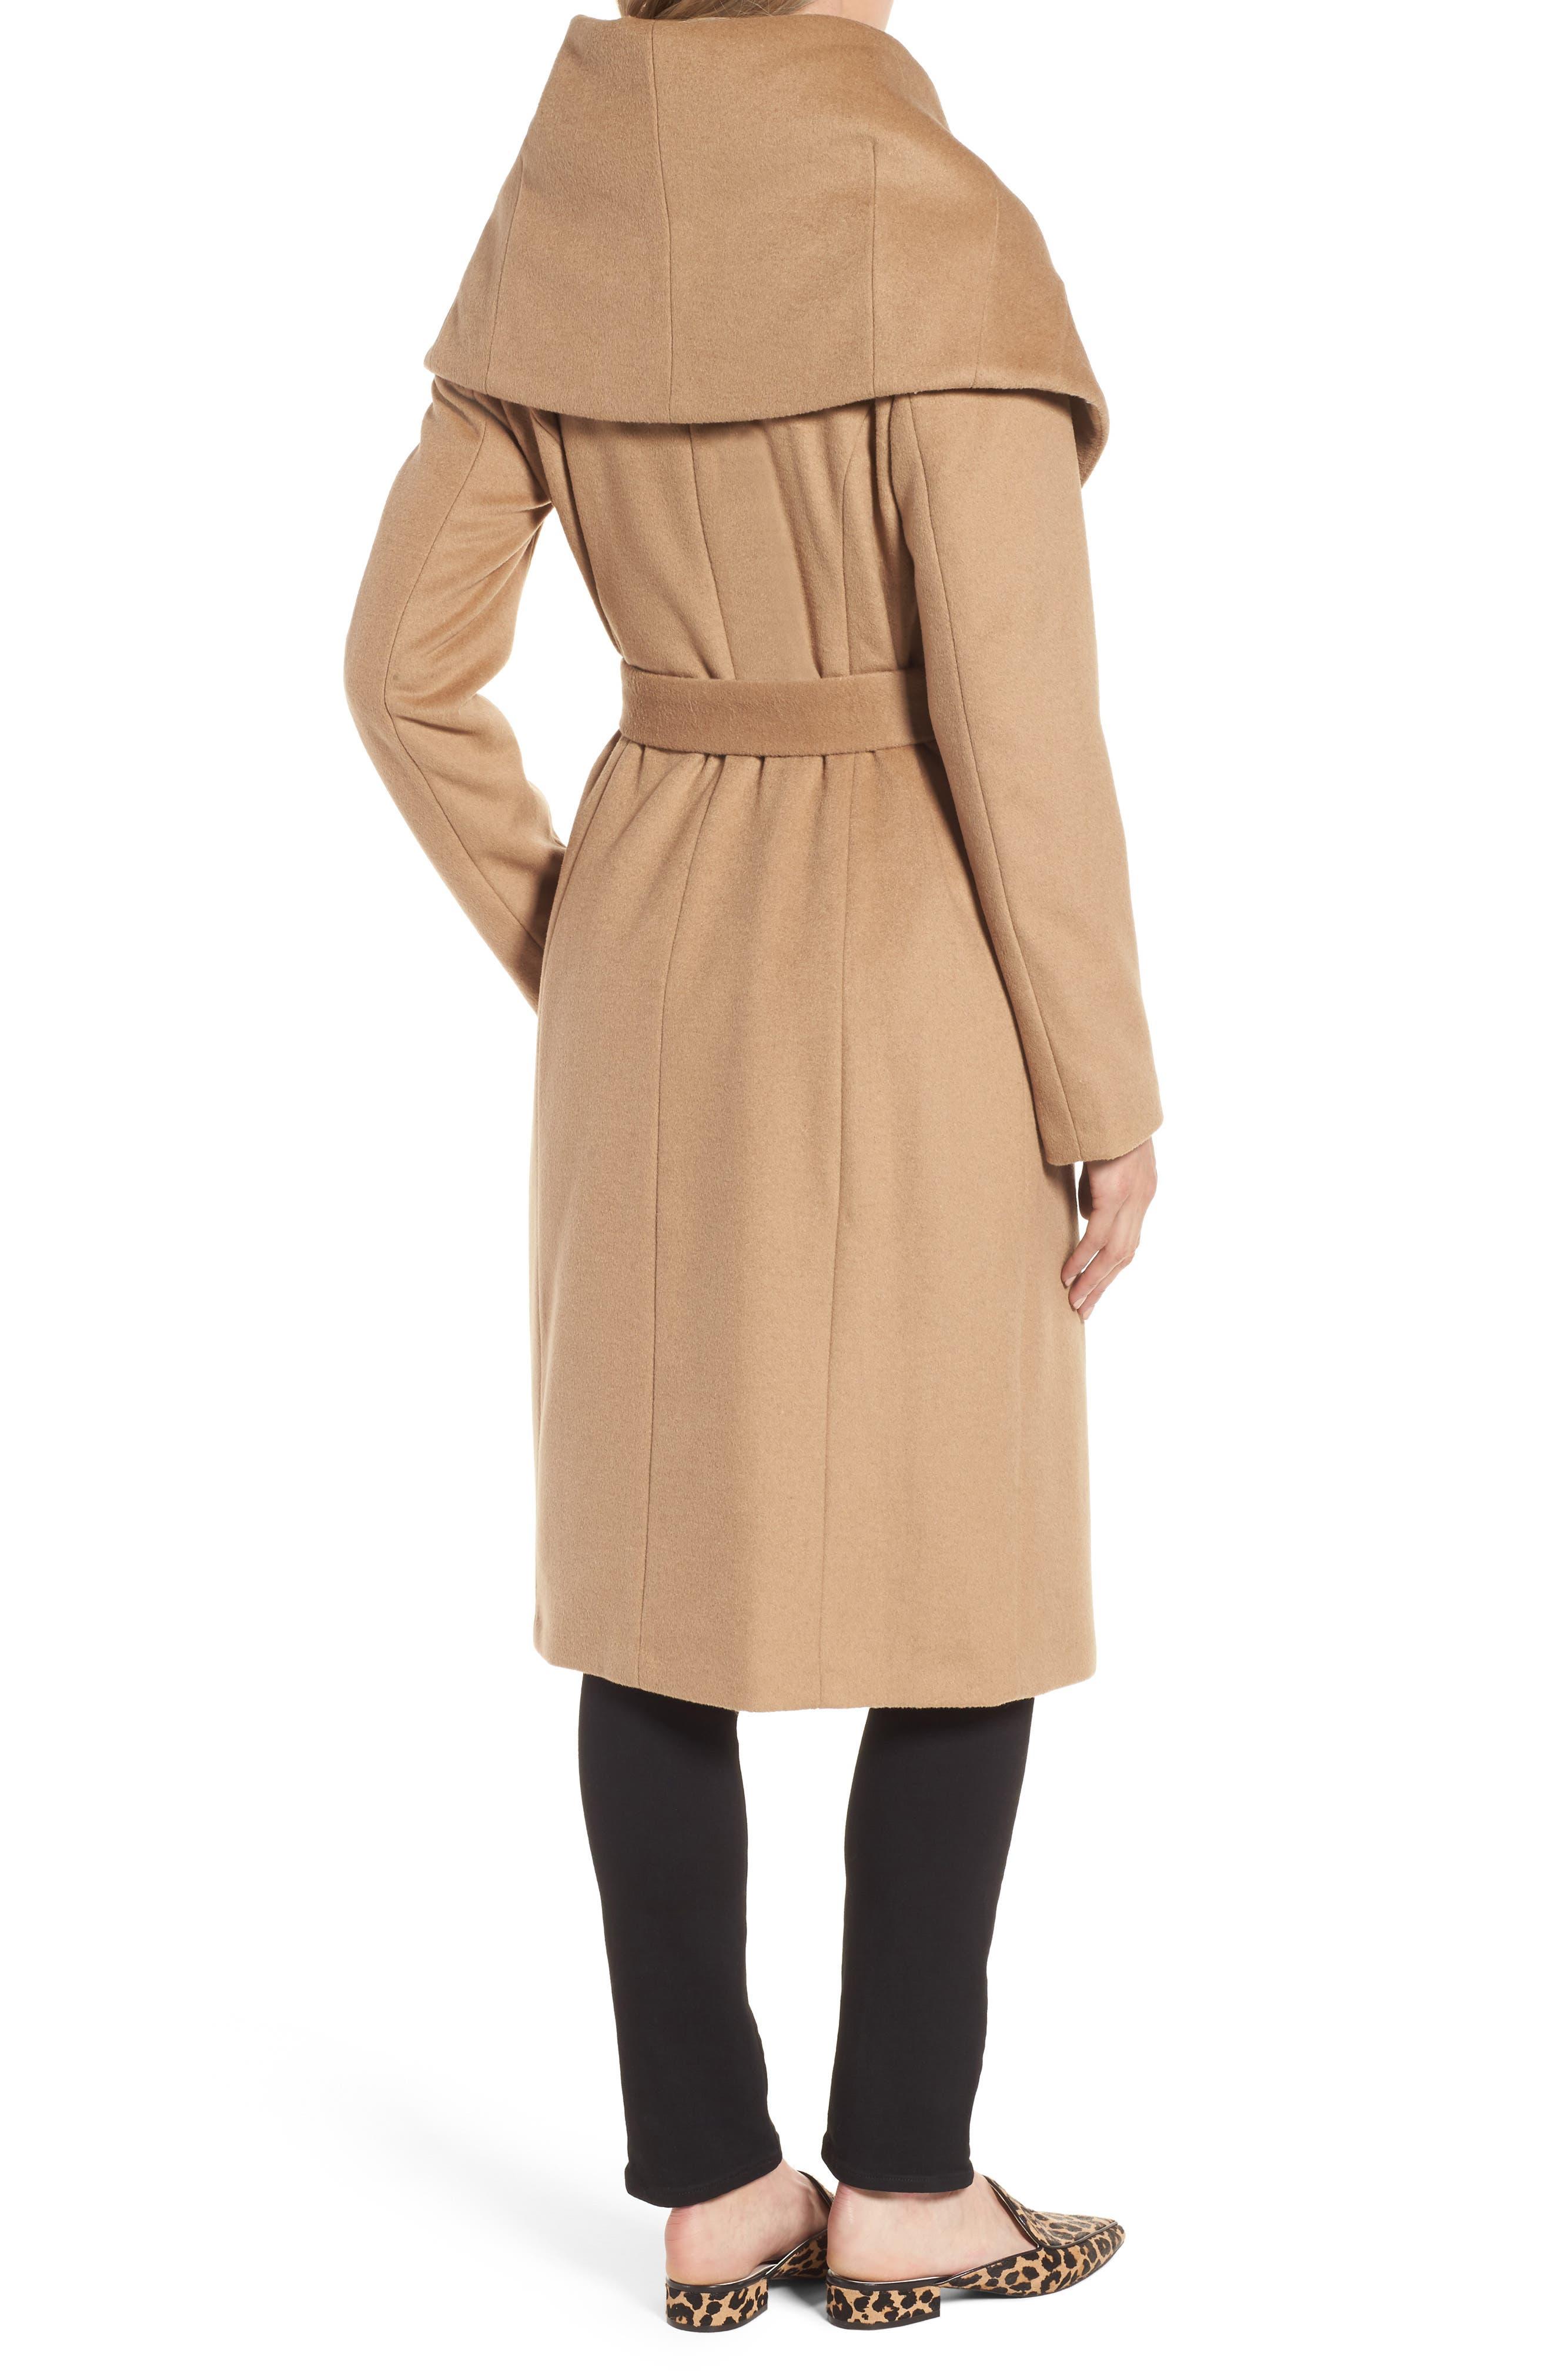 DKNY Wool Blend Shawl Collar Wrap Coat,                             Alternate thumbnail 2, color,                             252